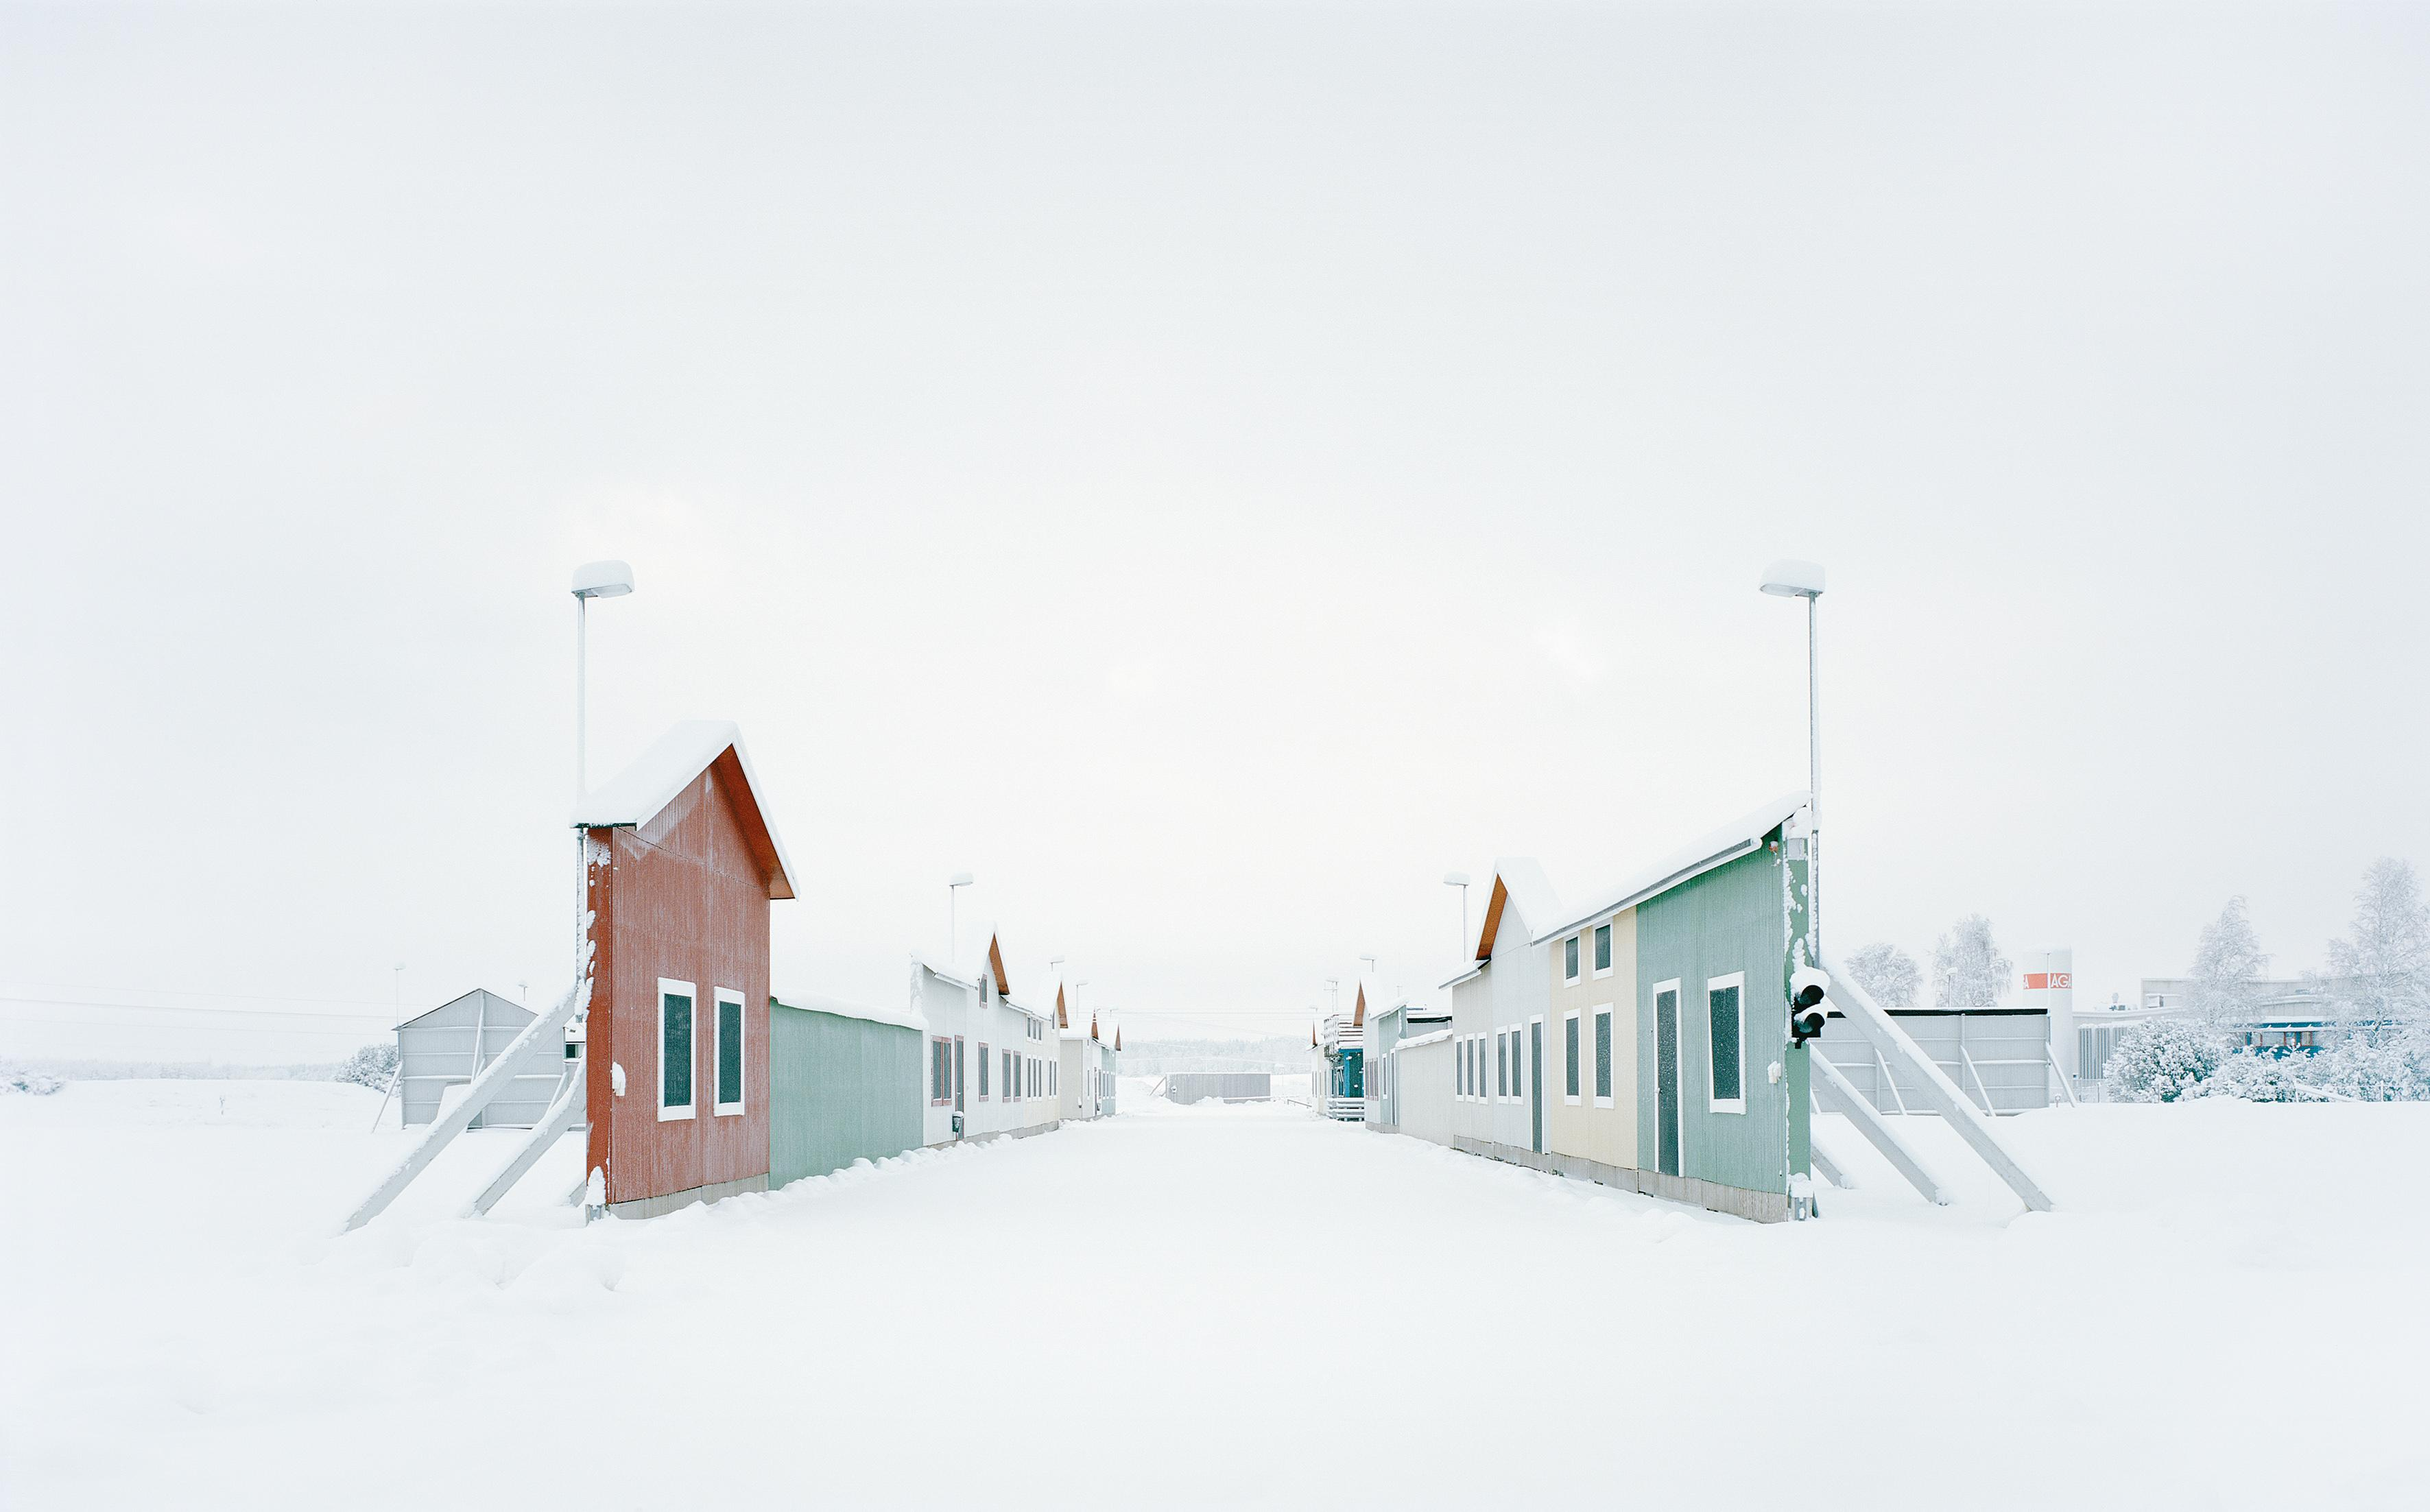 <p>Carson City, Sweden. (Photo: Gregor Sailer/Caters News) </p>